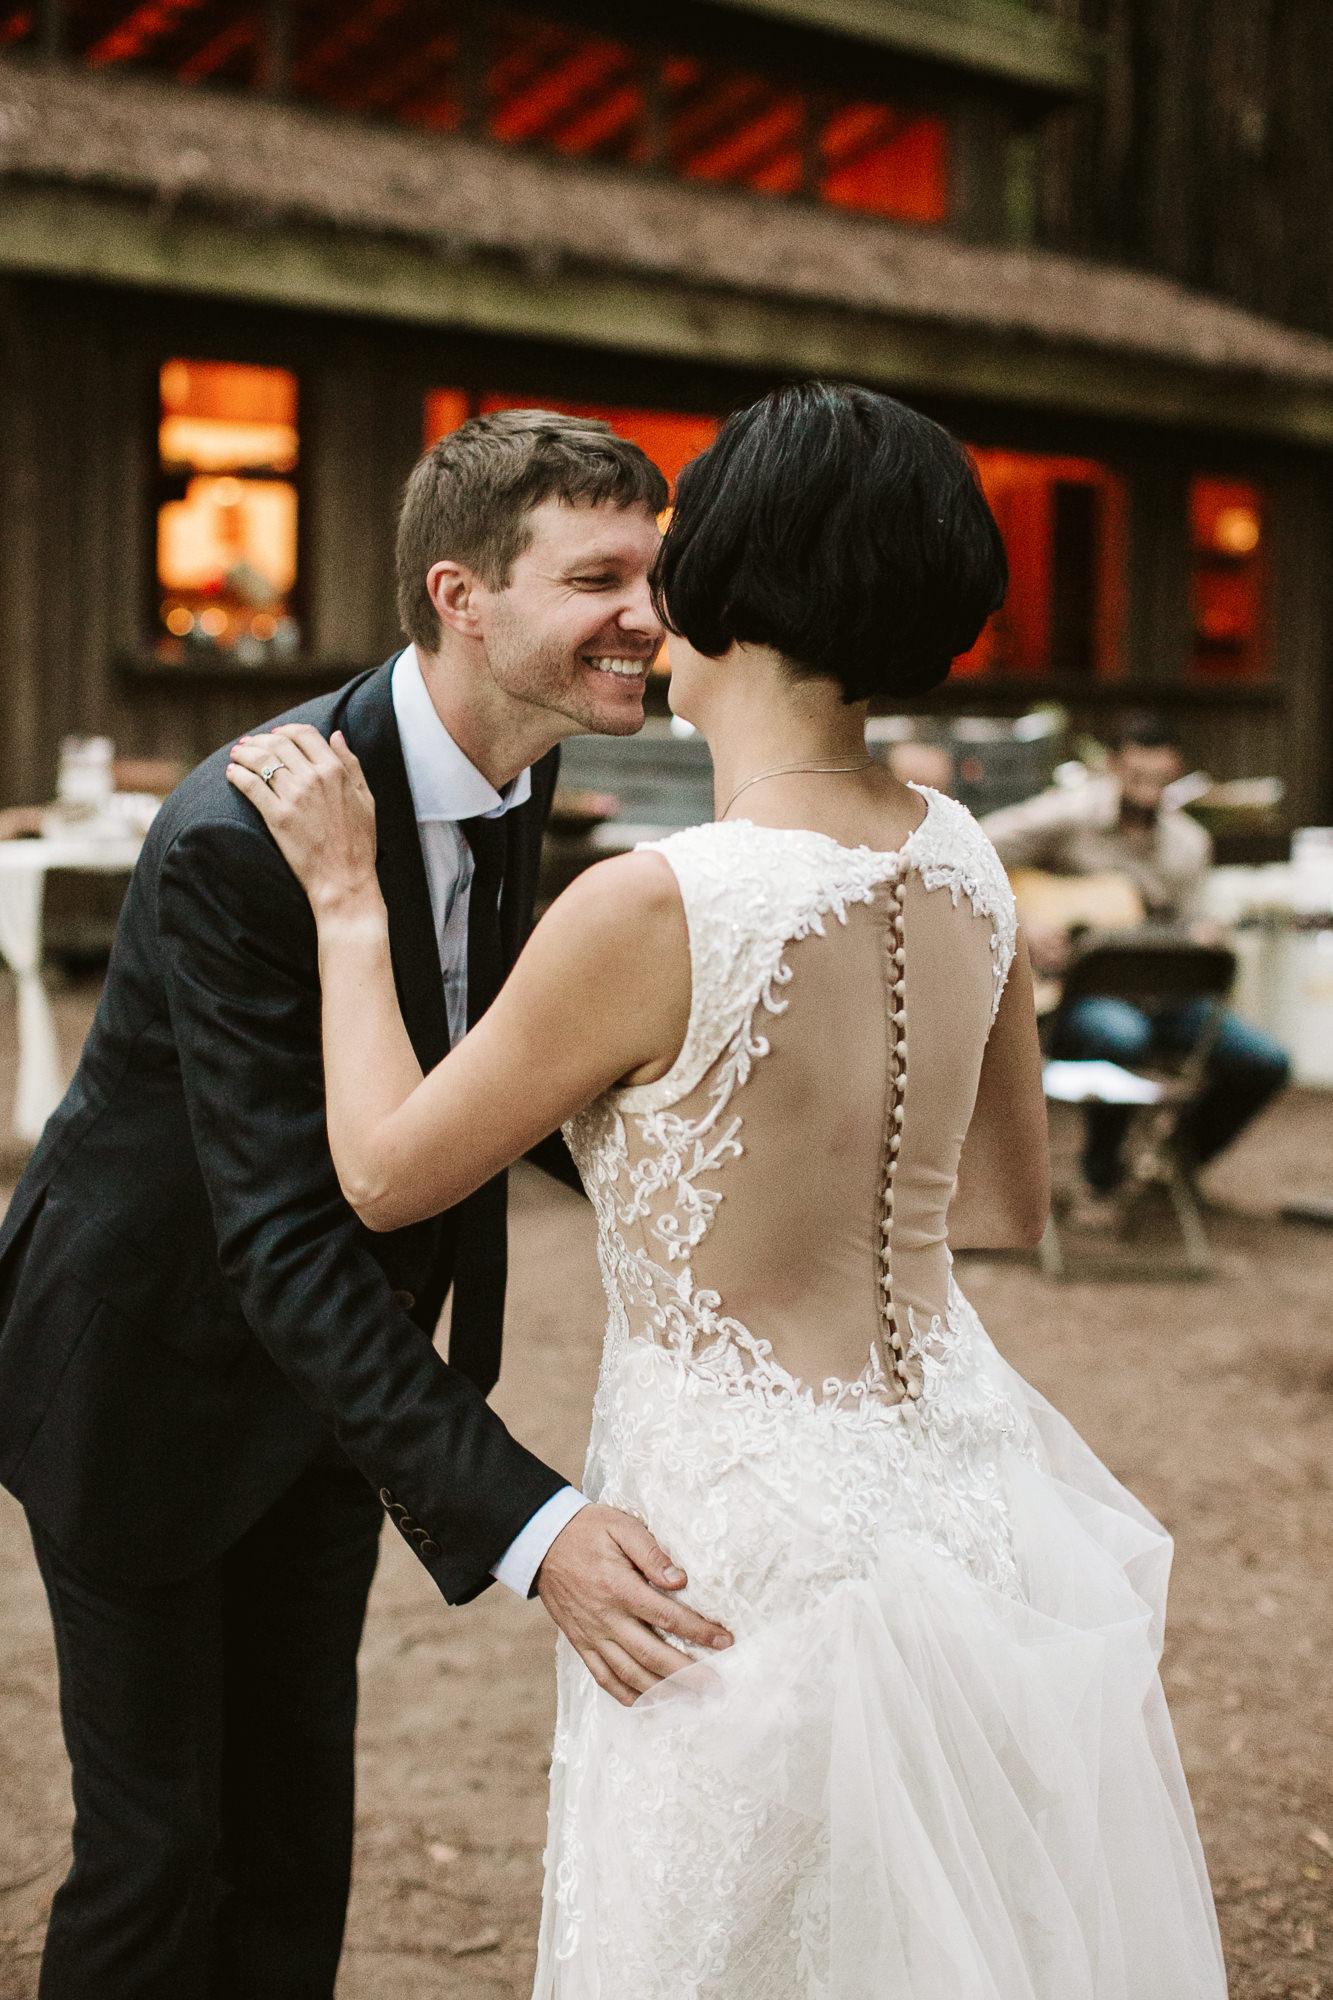 California-wedding-photographer-alfonso-flores-pamplin-groove-327.jpg